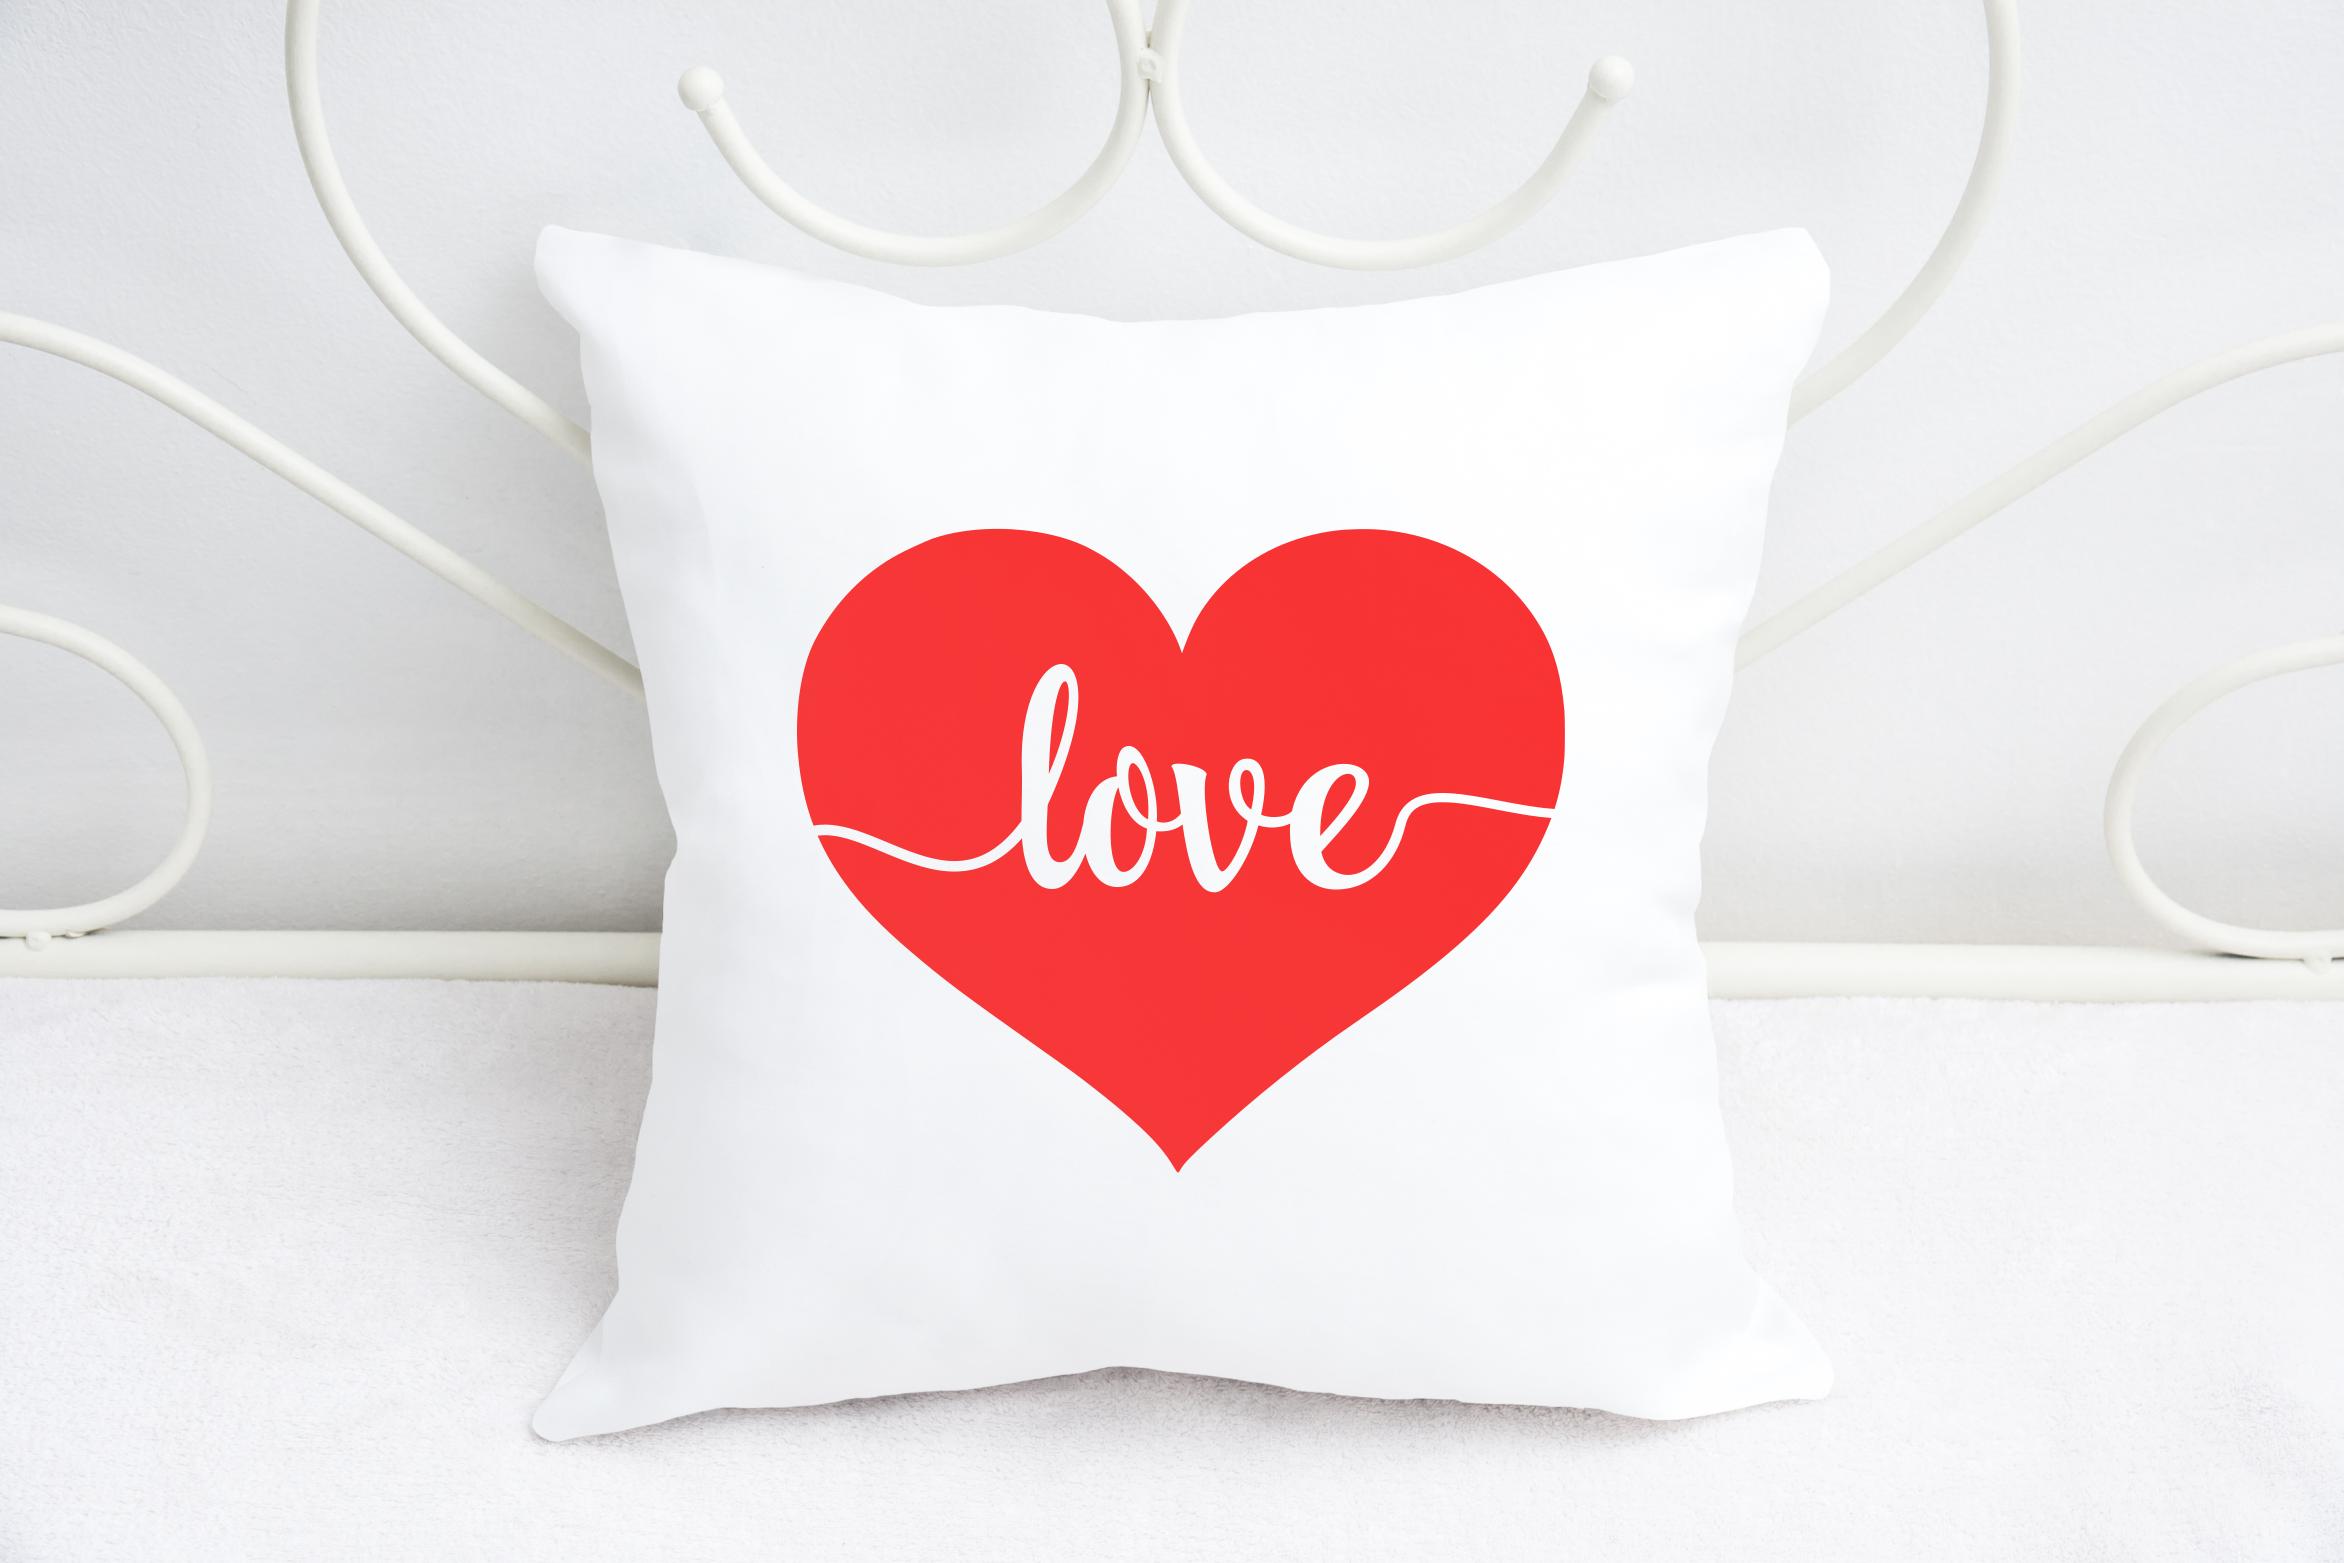 Love Svg, Heart Svg, Love Heart Svg, Valentine's Day Svg example image 3